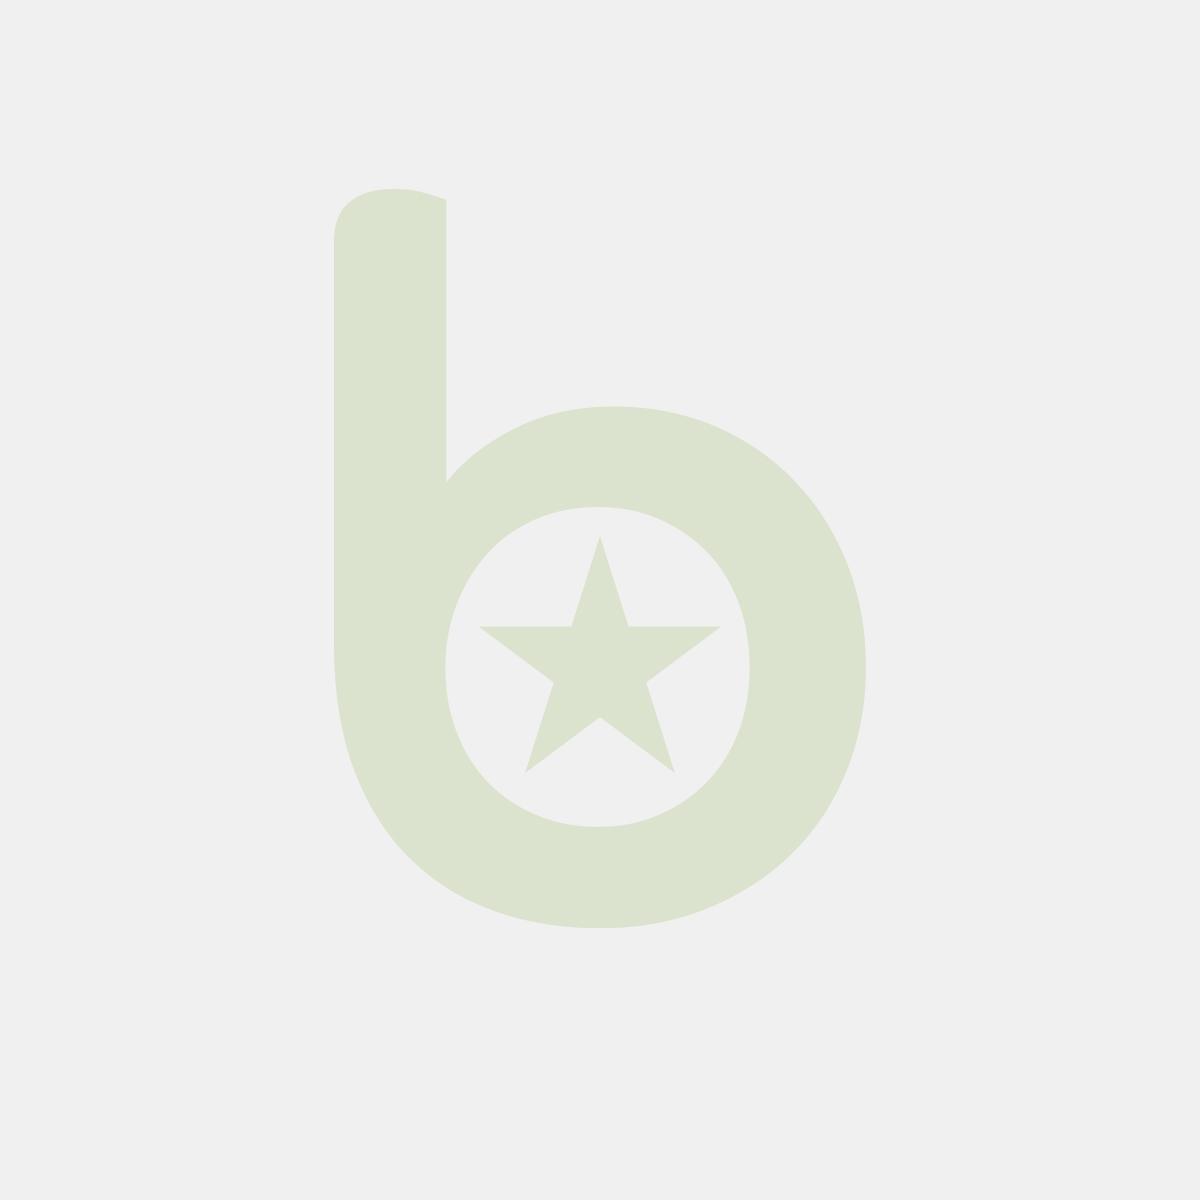 Nadstawa Chłodnicza Gn 1/4 8 X Gn 1/4